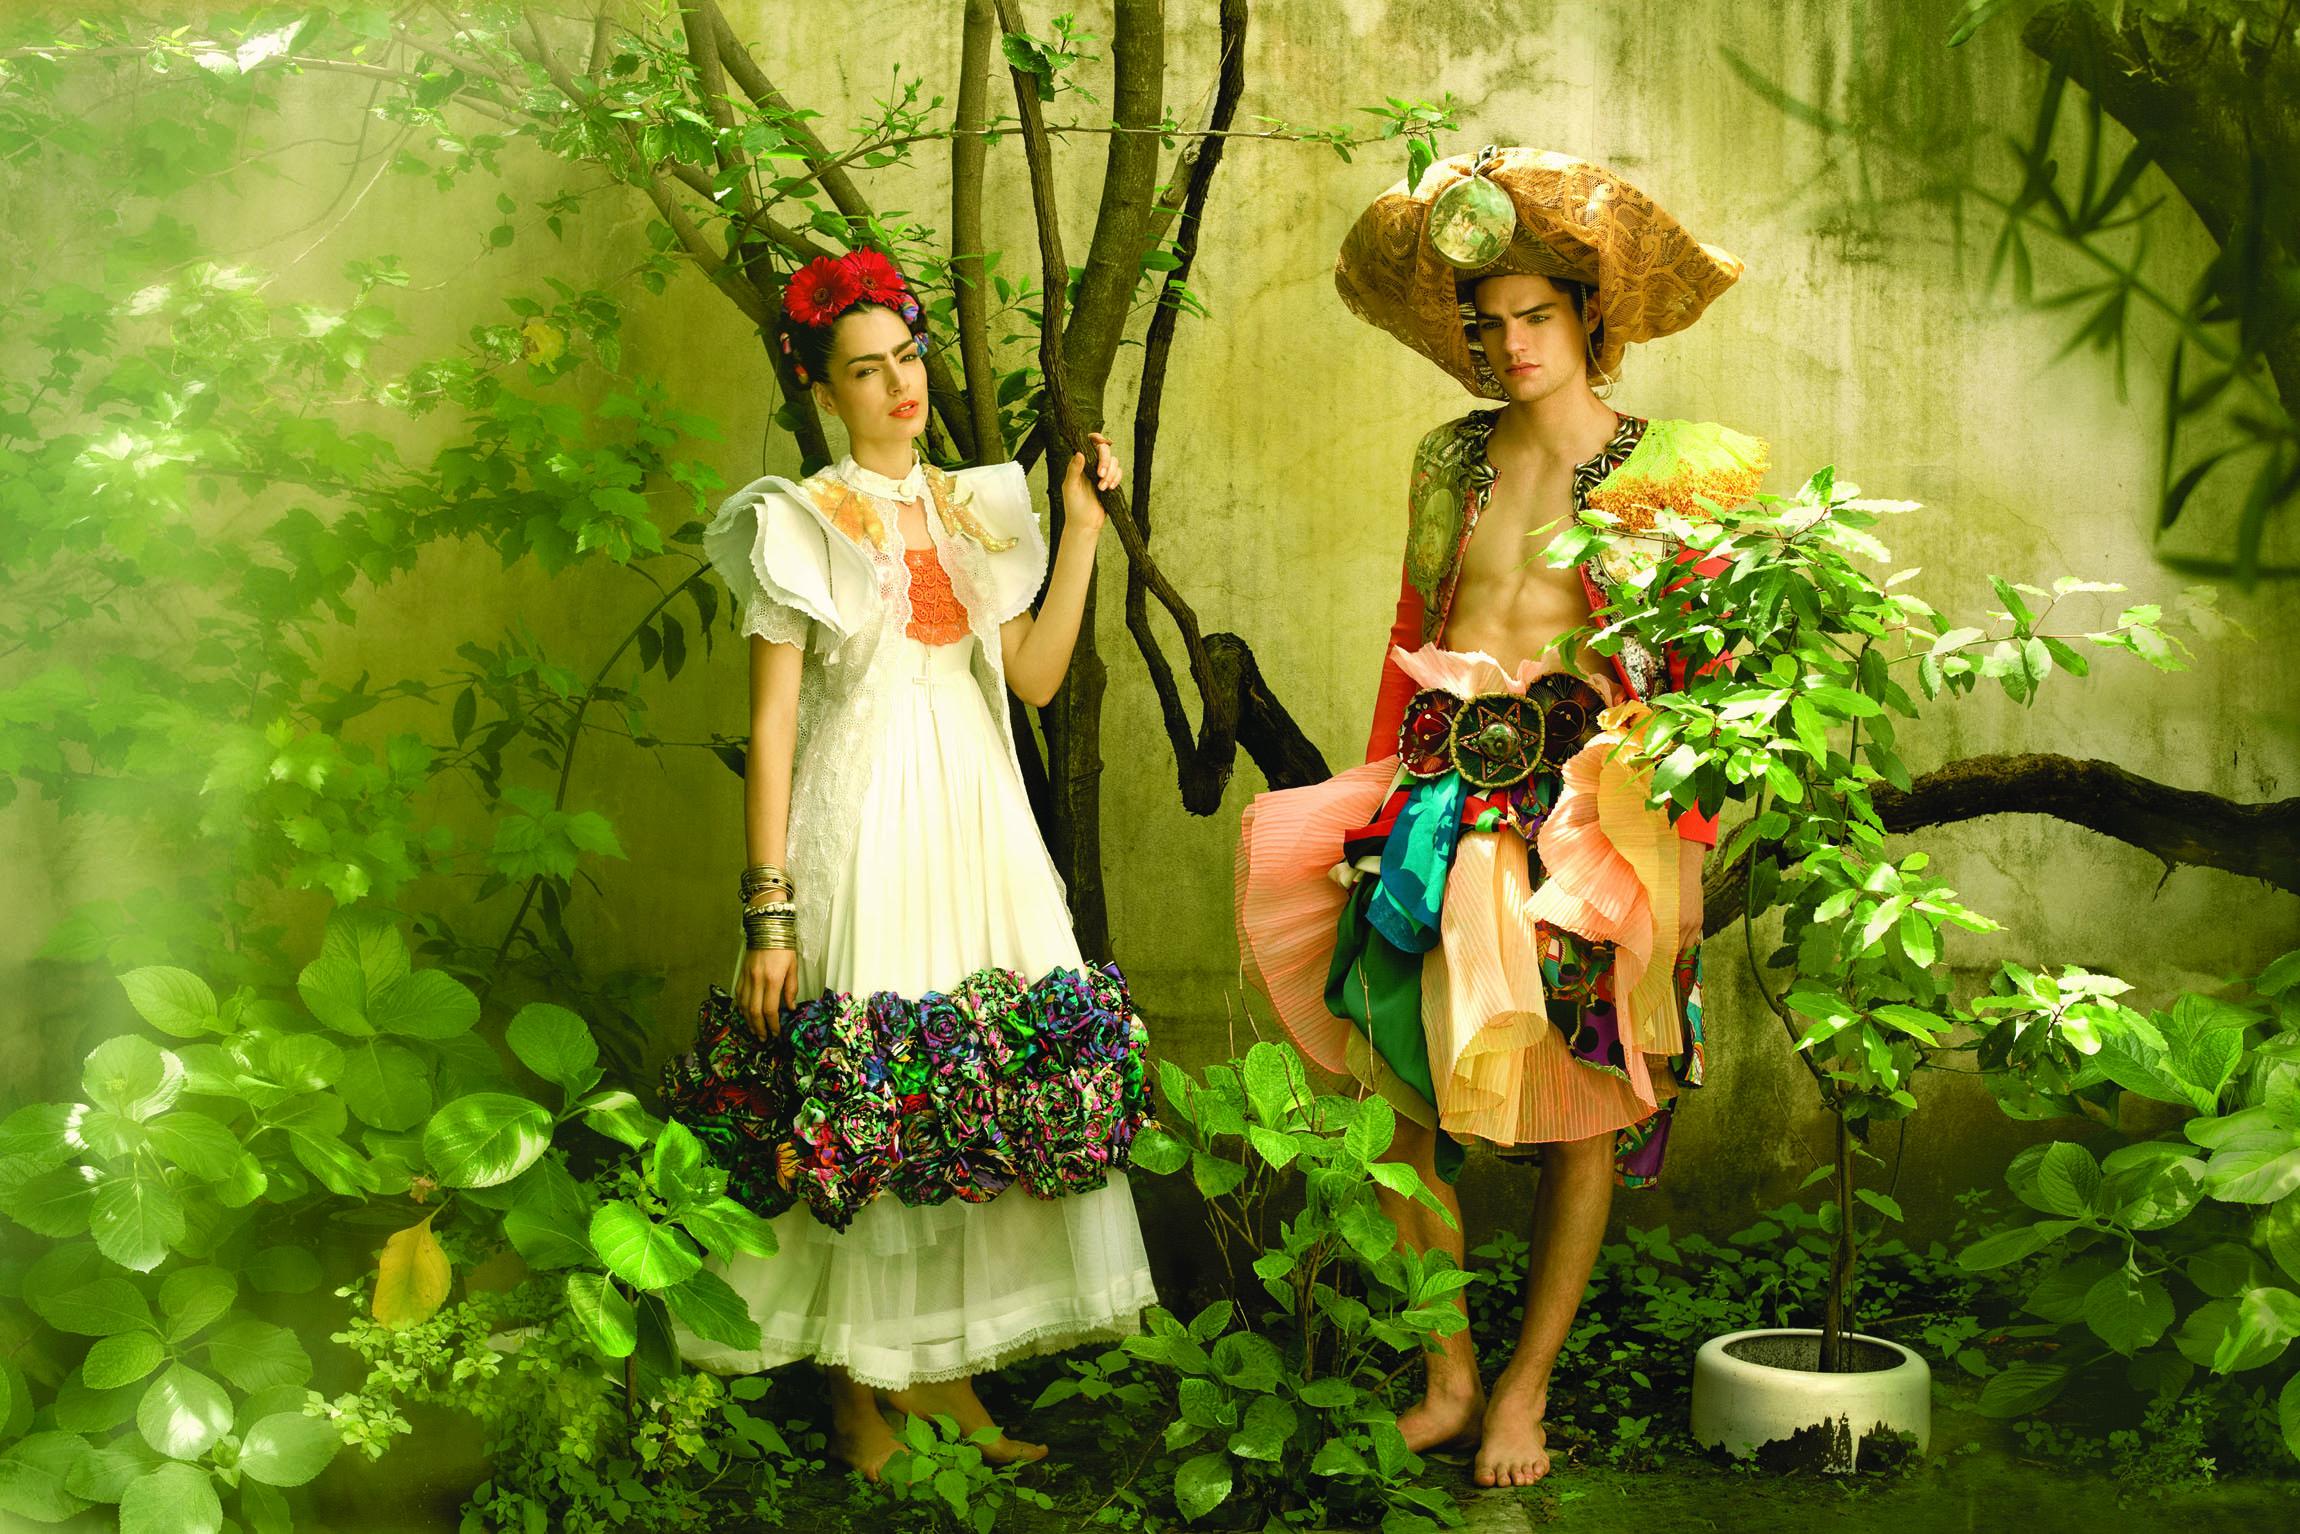 #News Estamos por revolucionar la moda en Latinoamérica